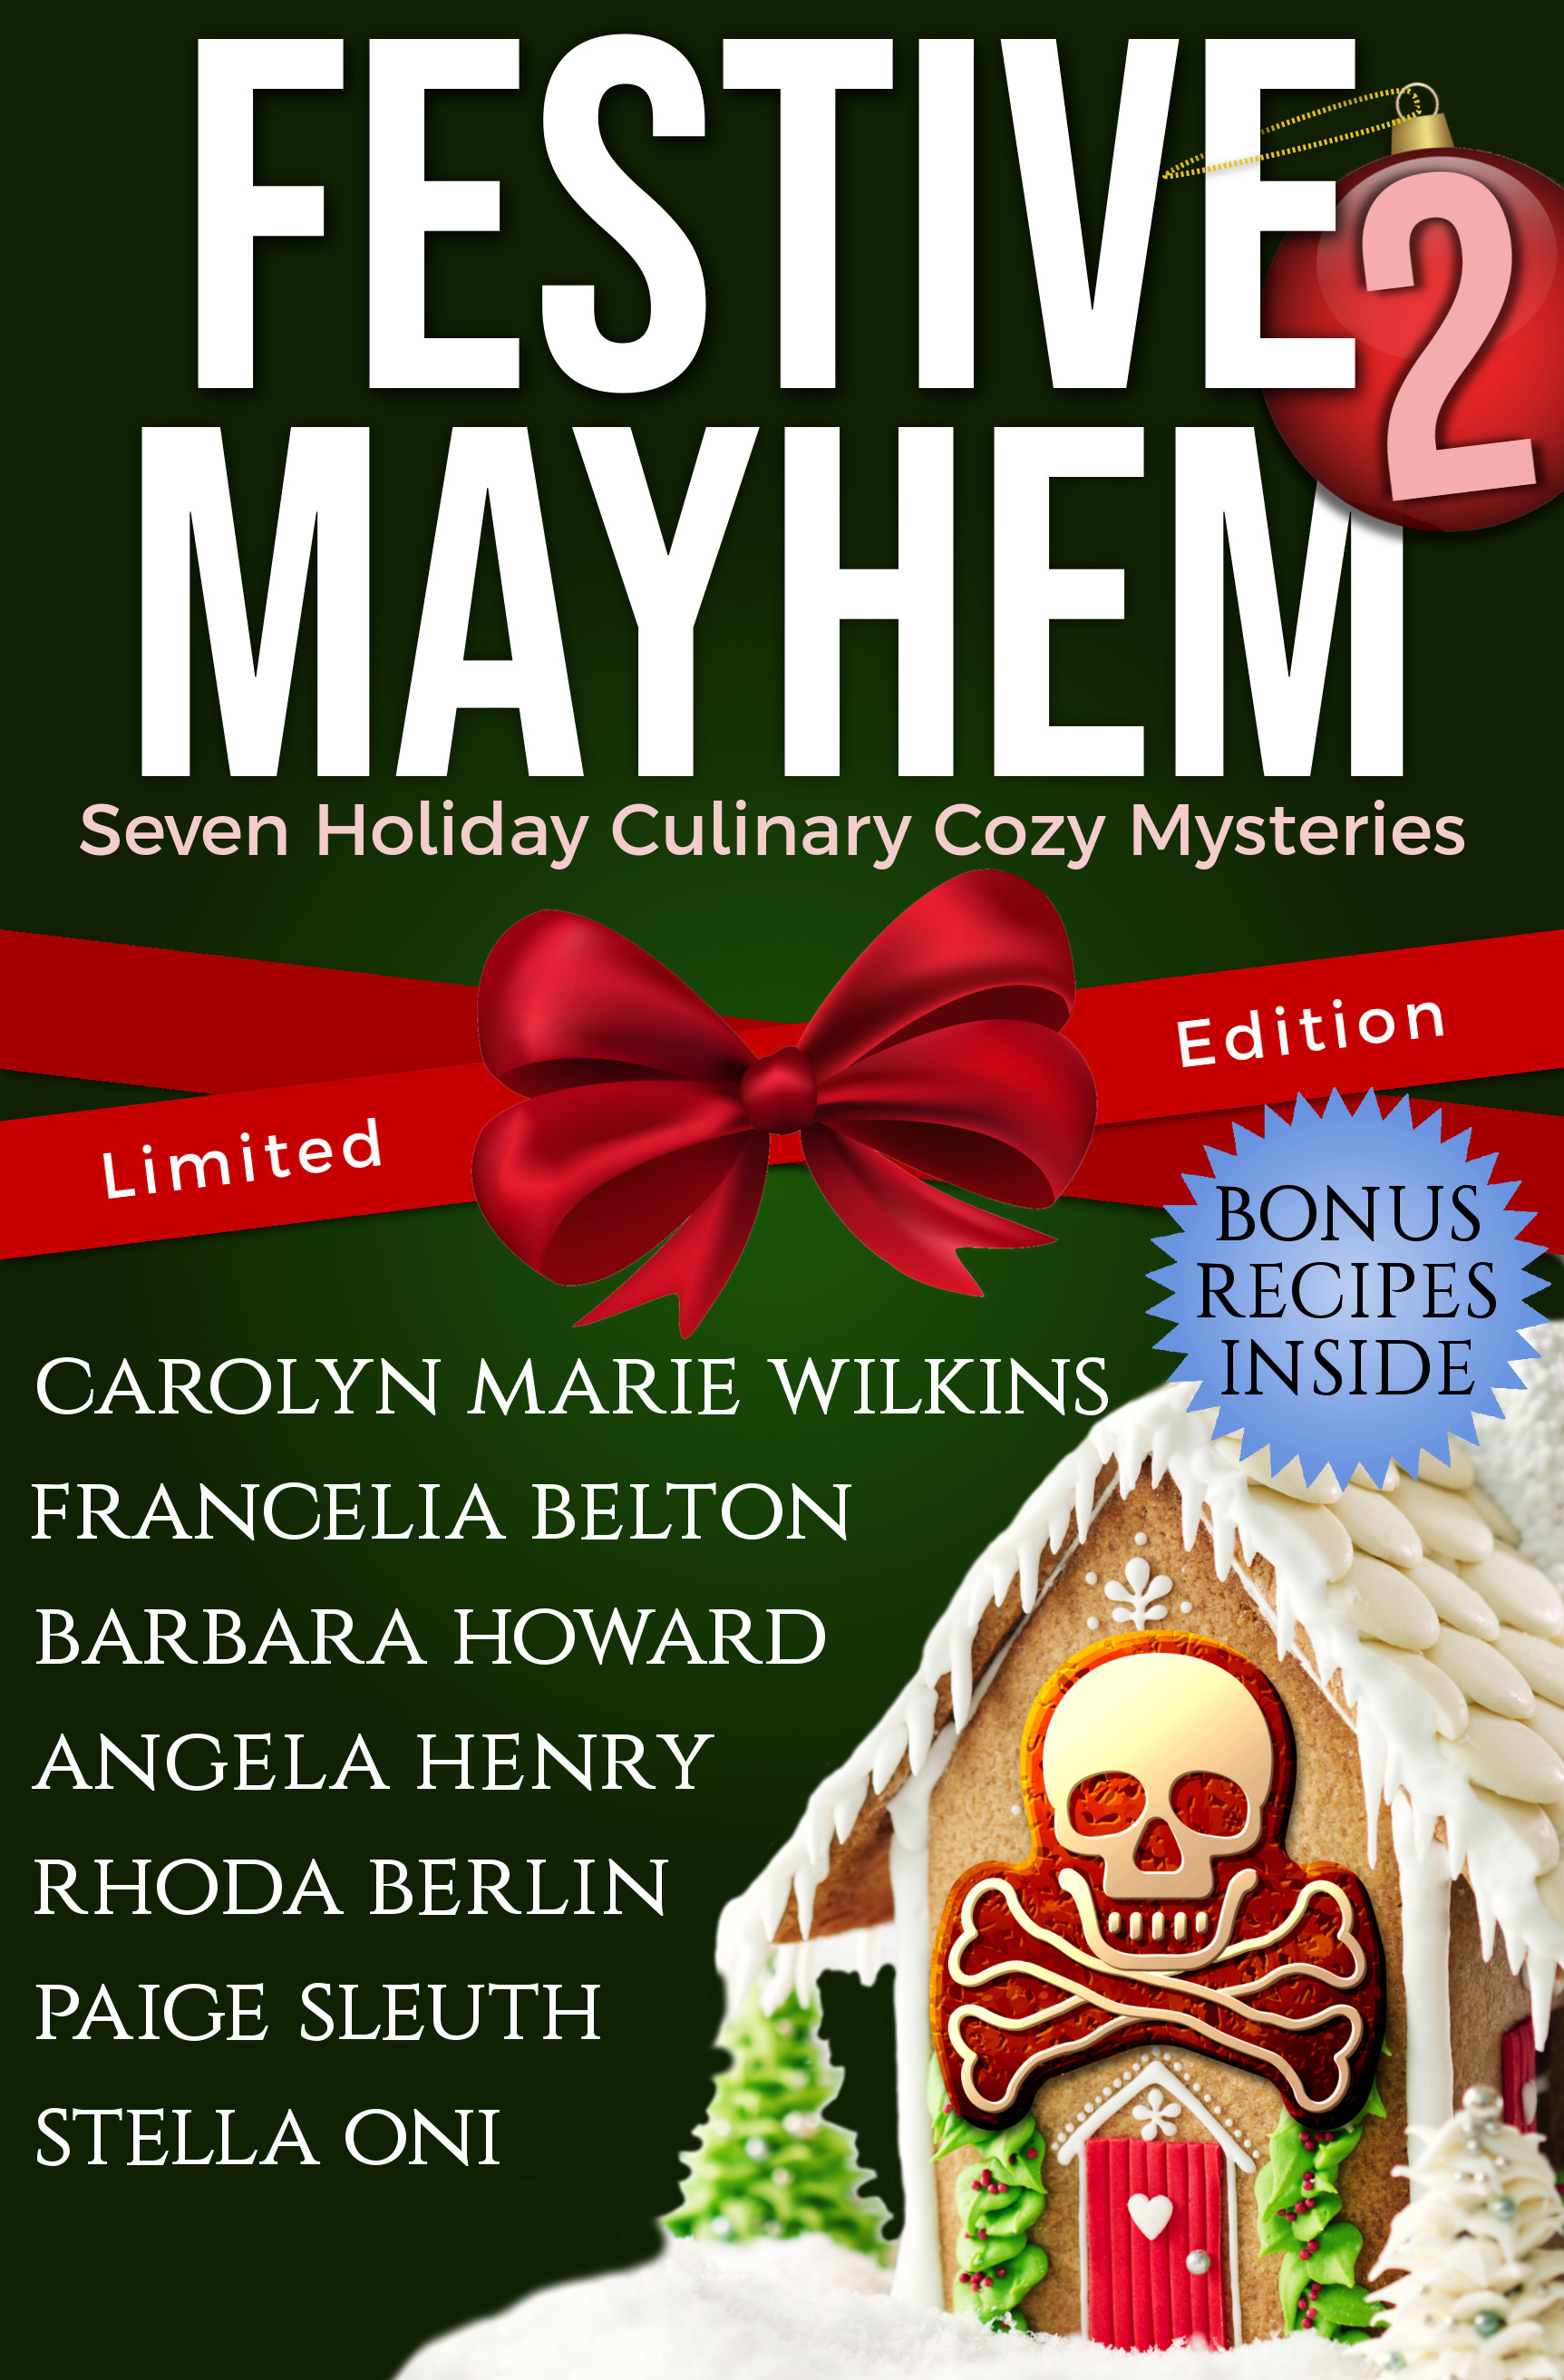 festive+mayhem+2+cover+final+20210906